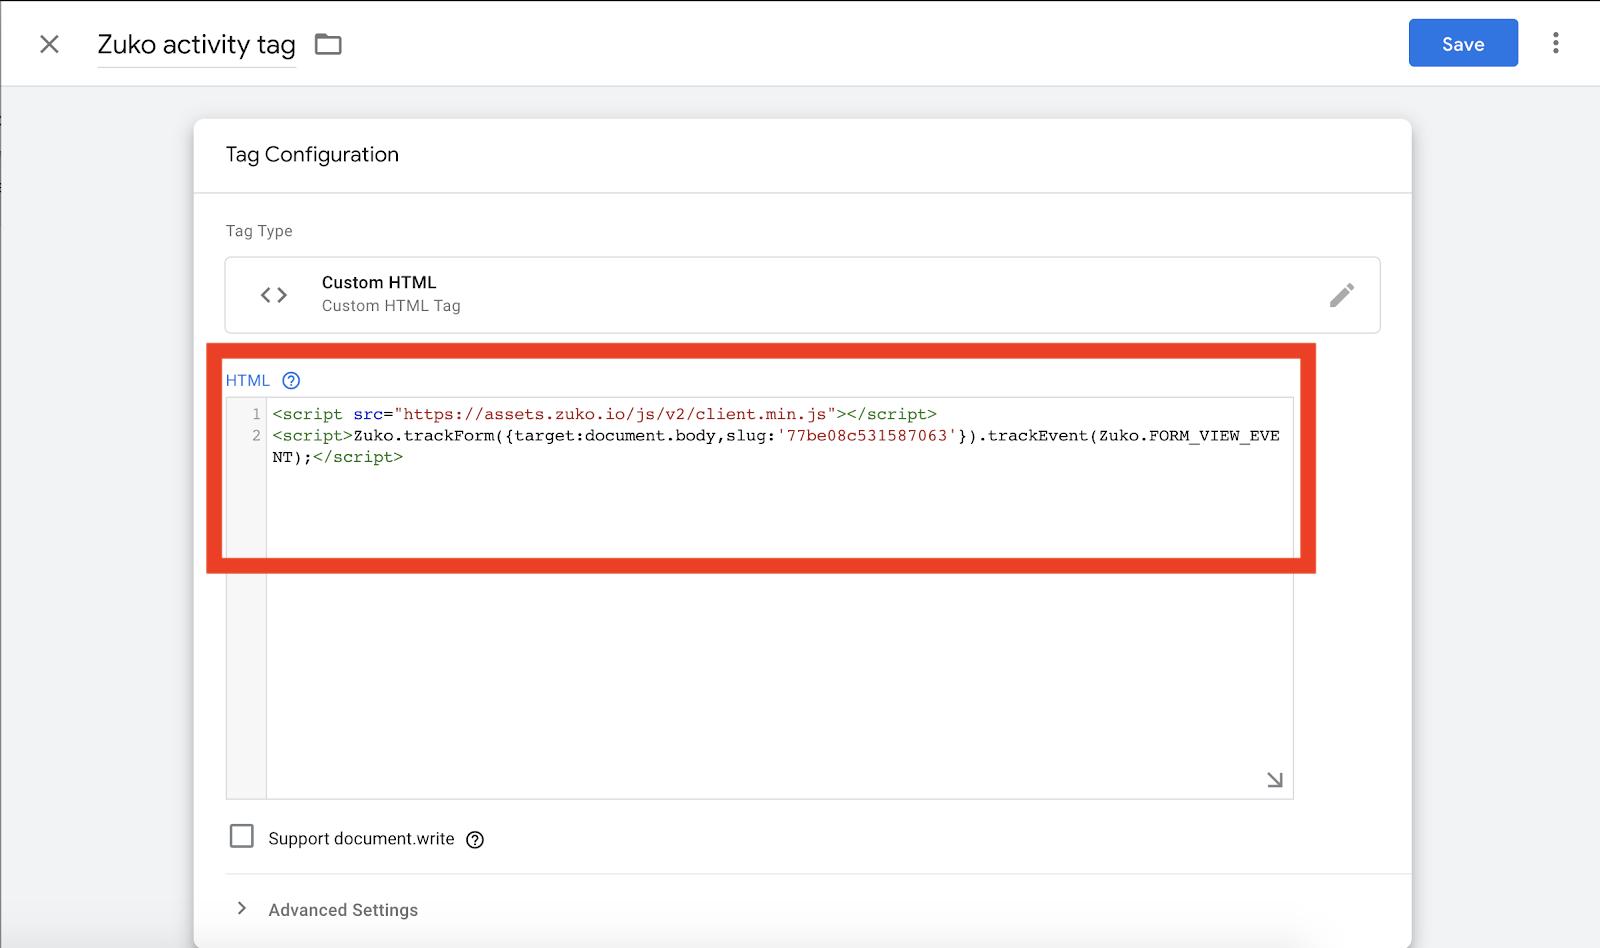 Zuko Activity Tracking Tag Screenshot